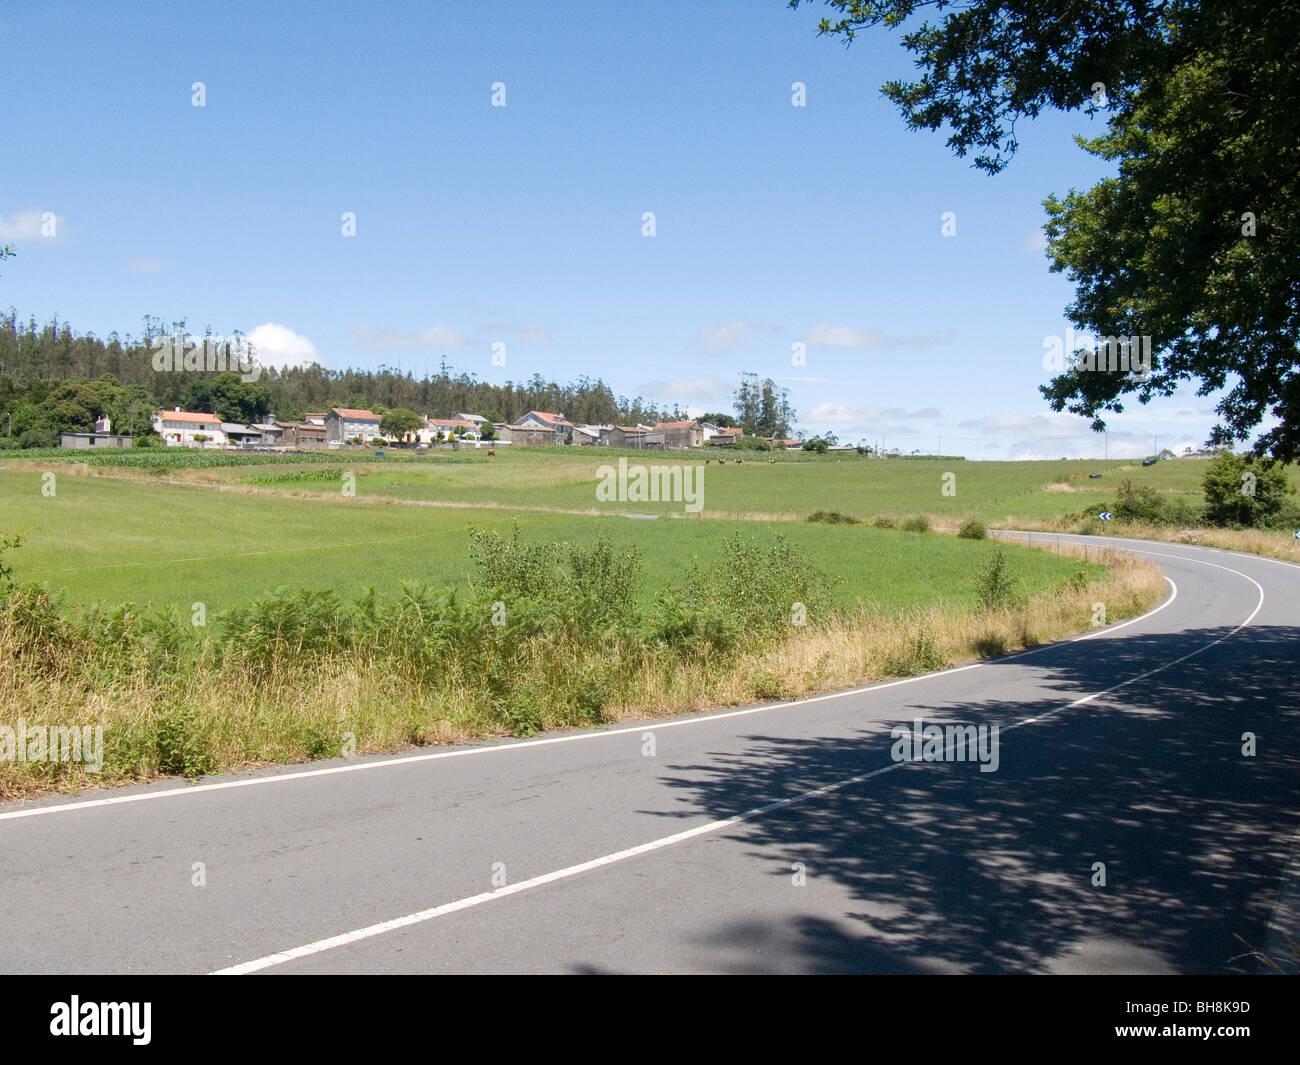 Camino de Santiago, road to Finisterre - Stock Image